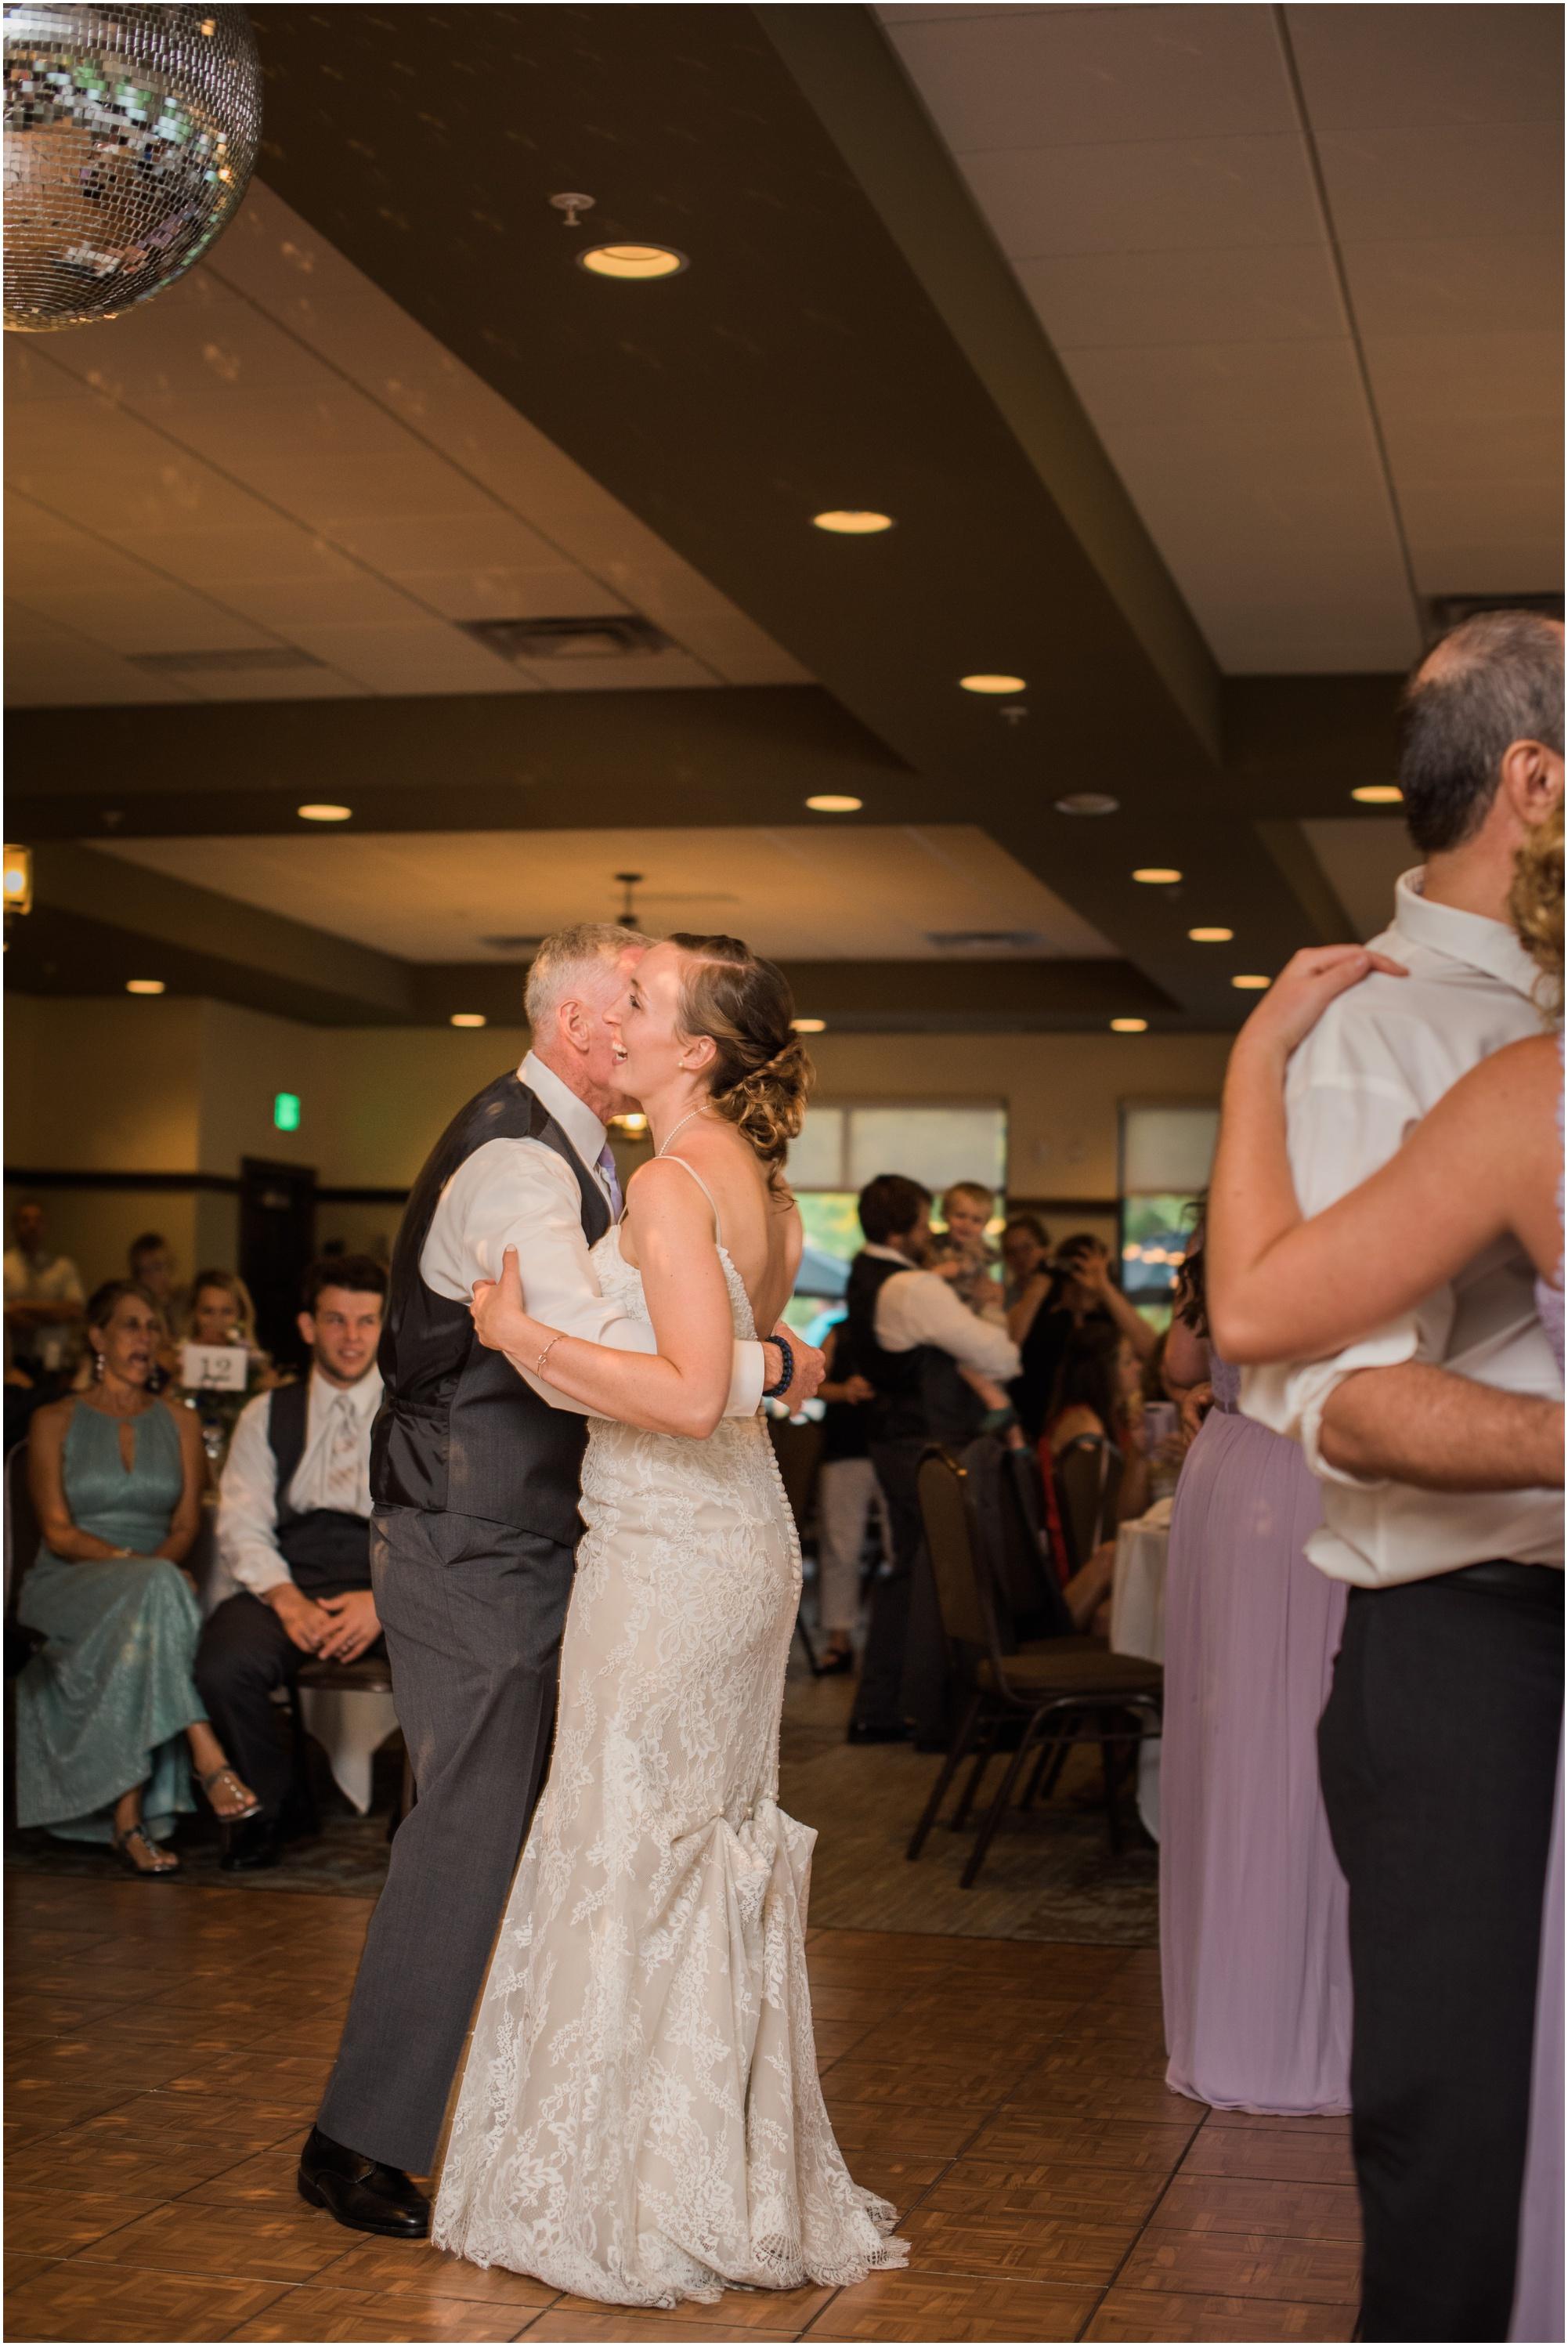 Wisconsin-Wedding-Photographer-Reedsburg-Country-Club-Kaela-and Matt-Wedding-899.jpg